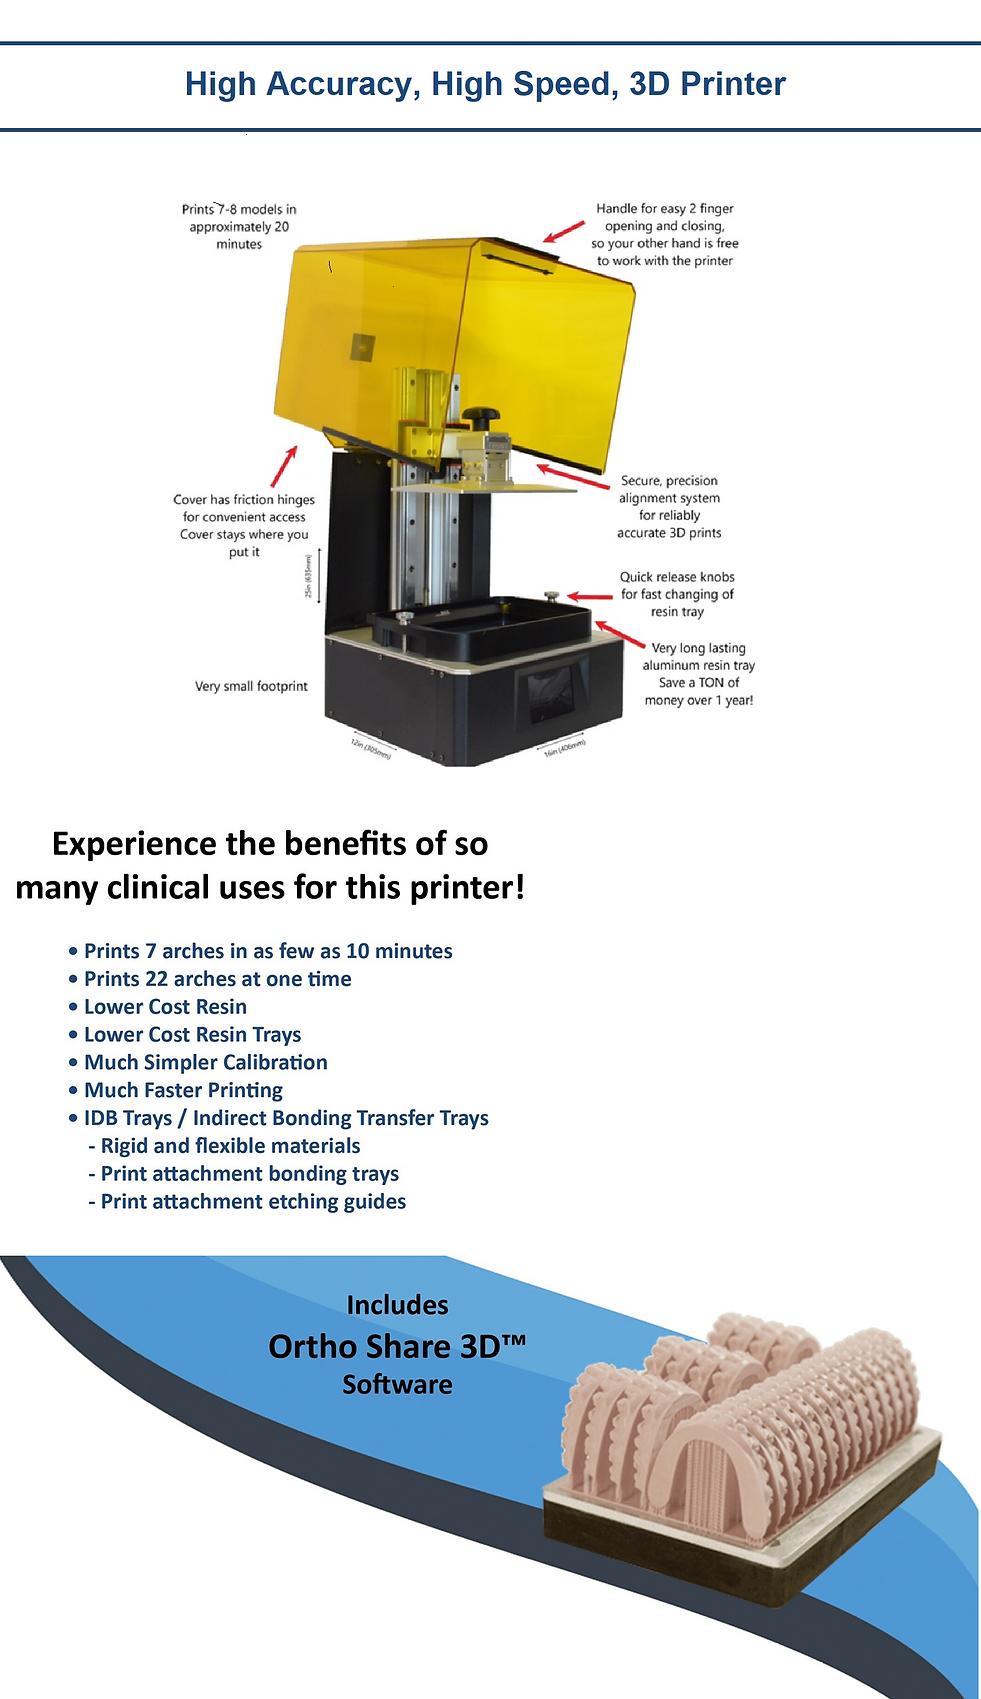 3D orthodontic printer